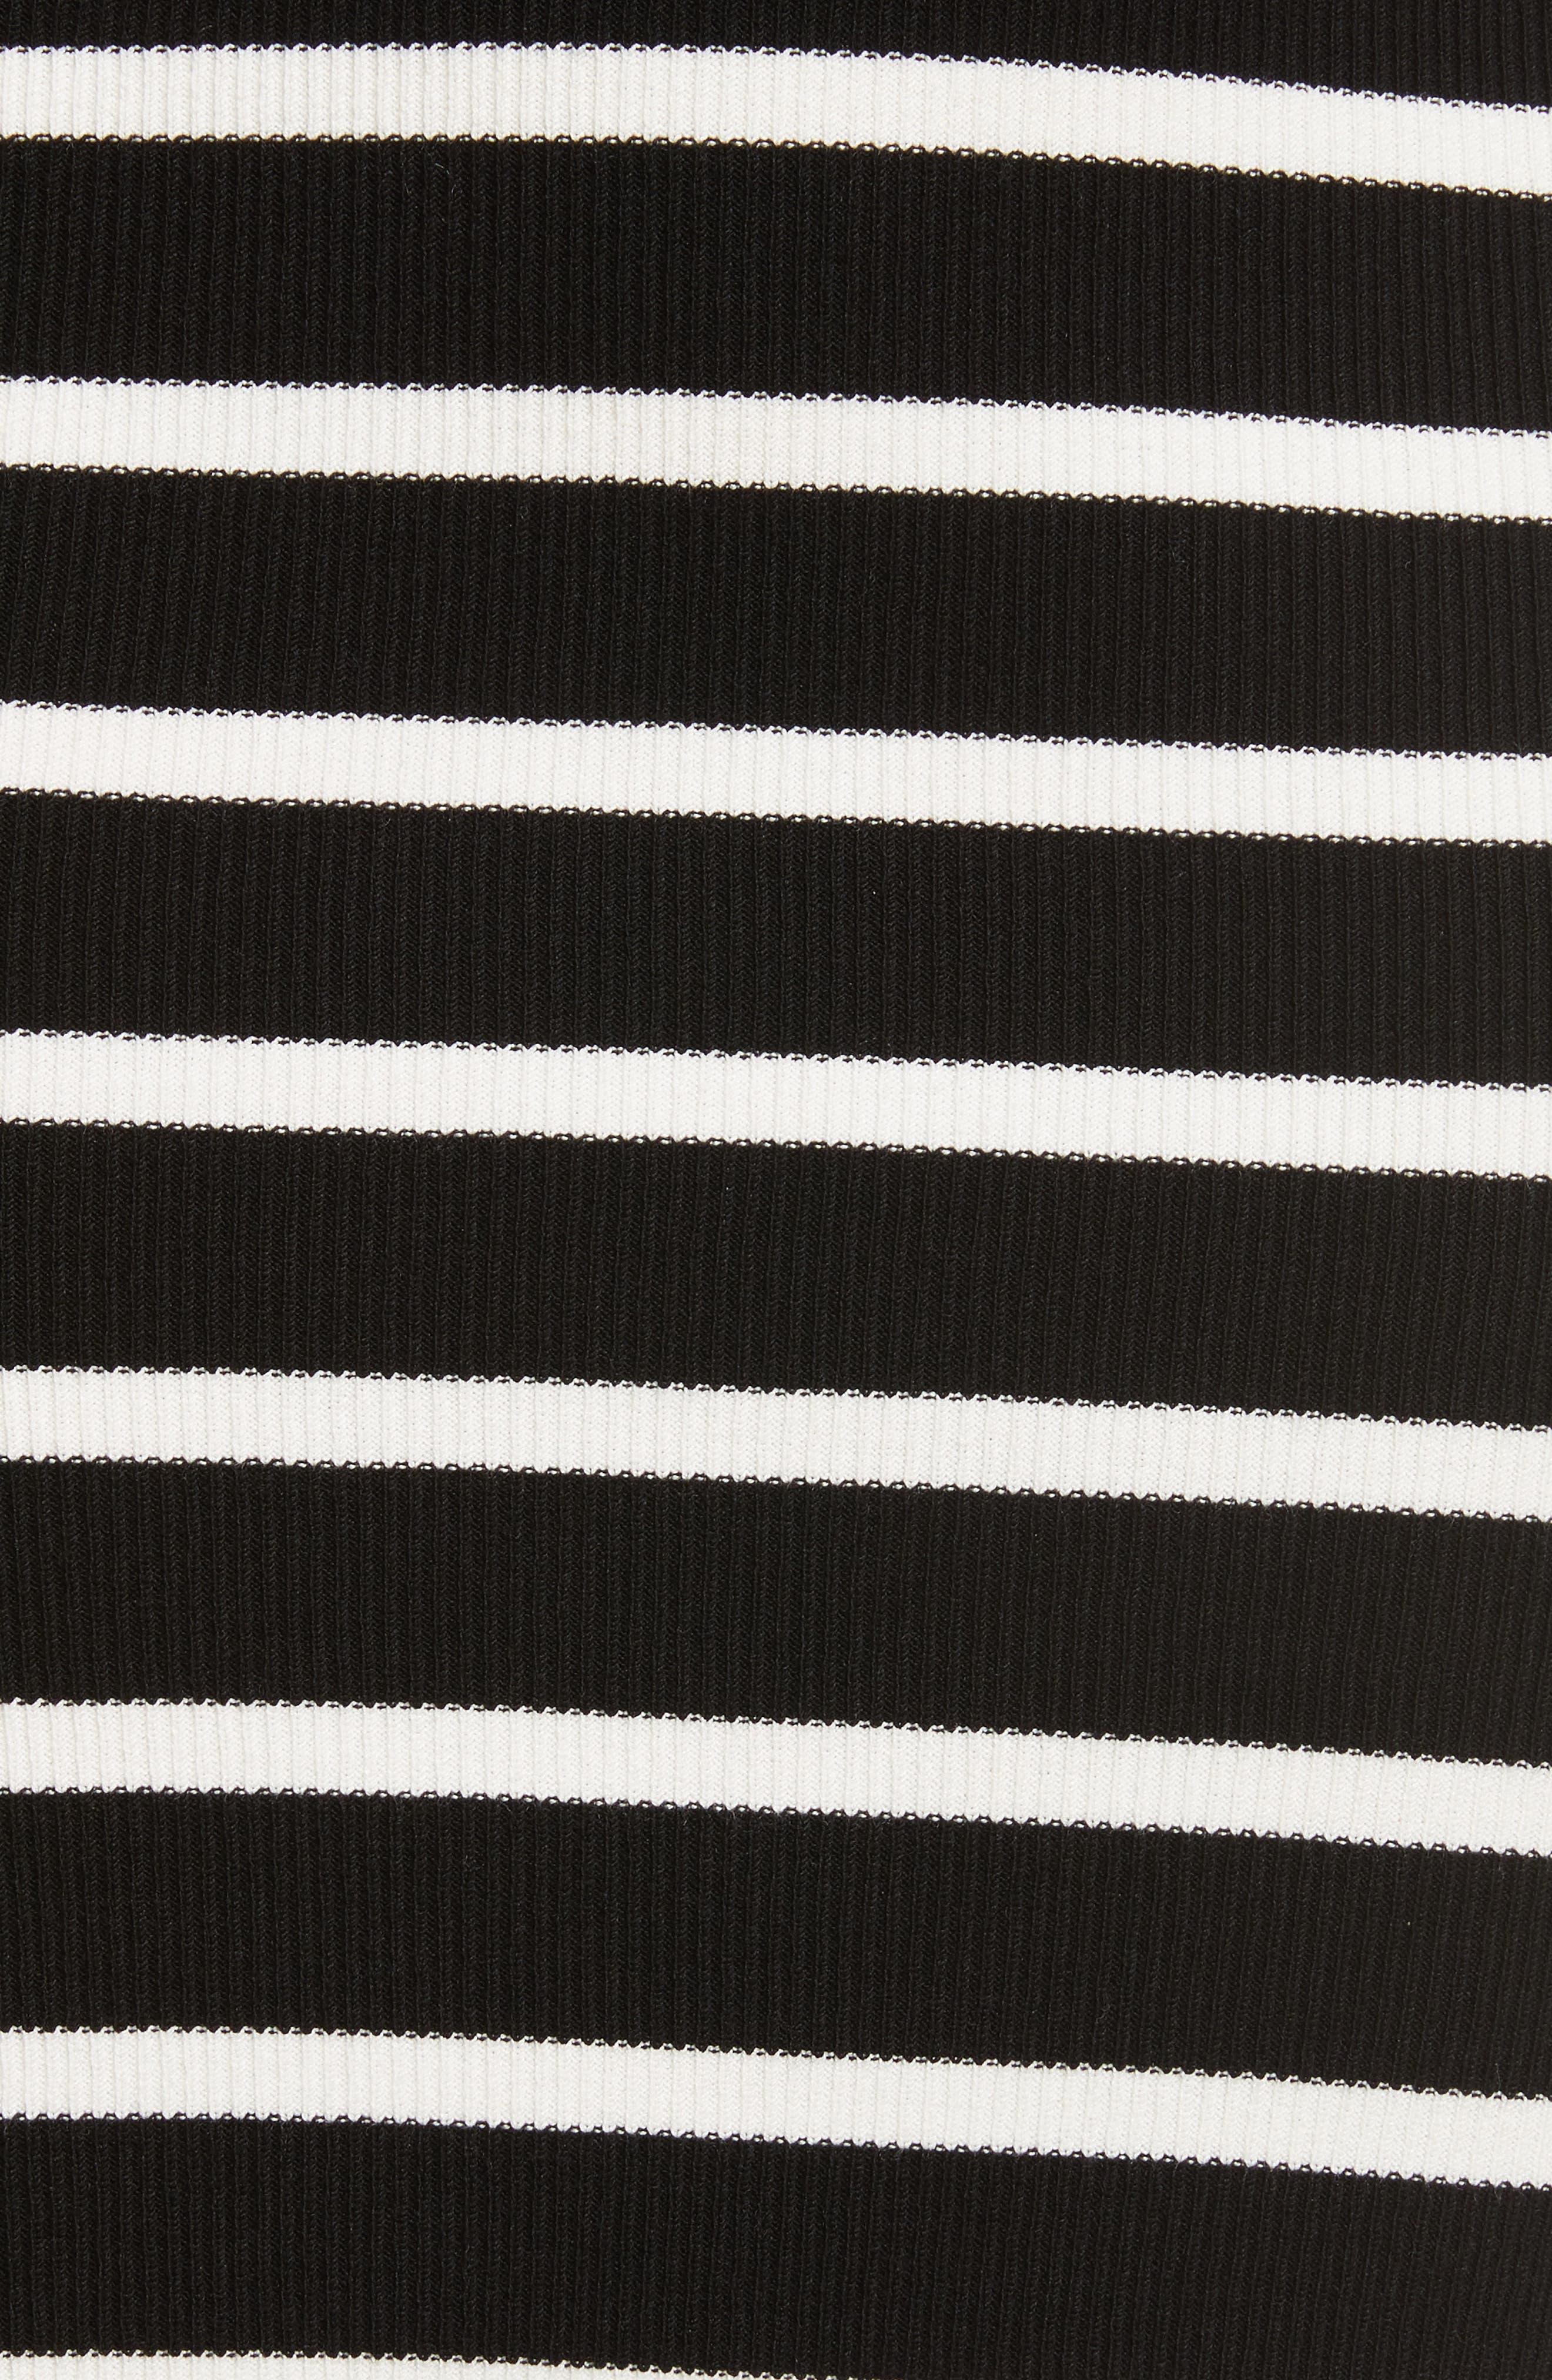 Prosecco Stripe Knit Dress,                             Alternate thumbnail 5, color,                             016